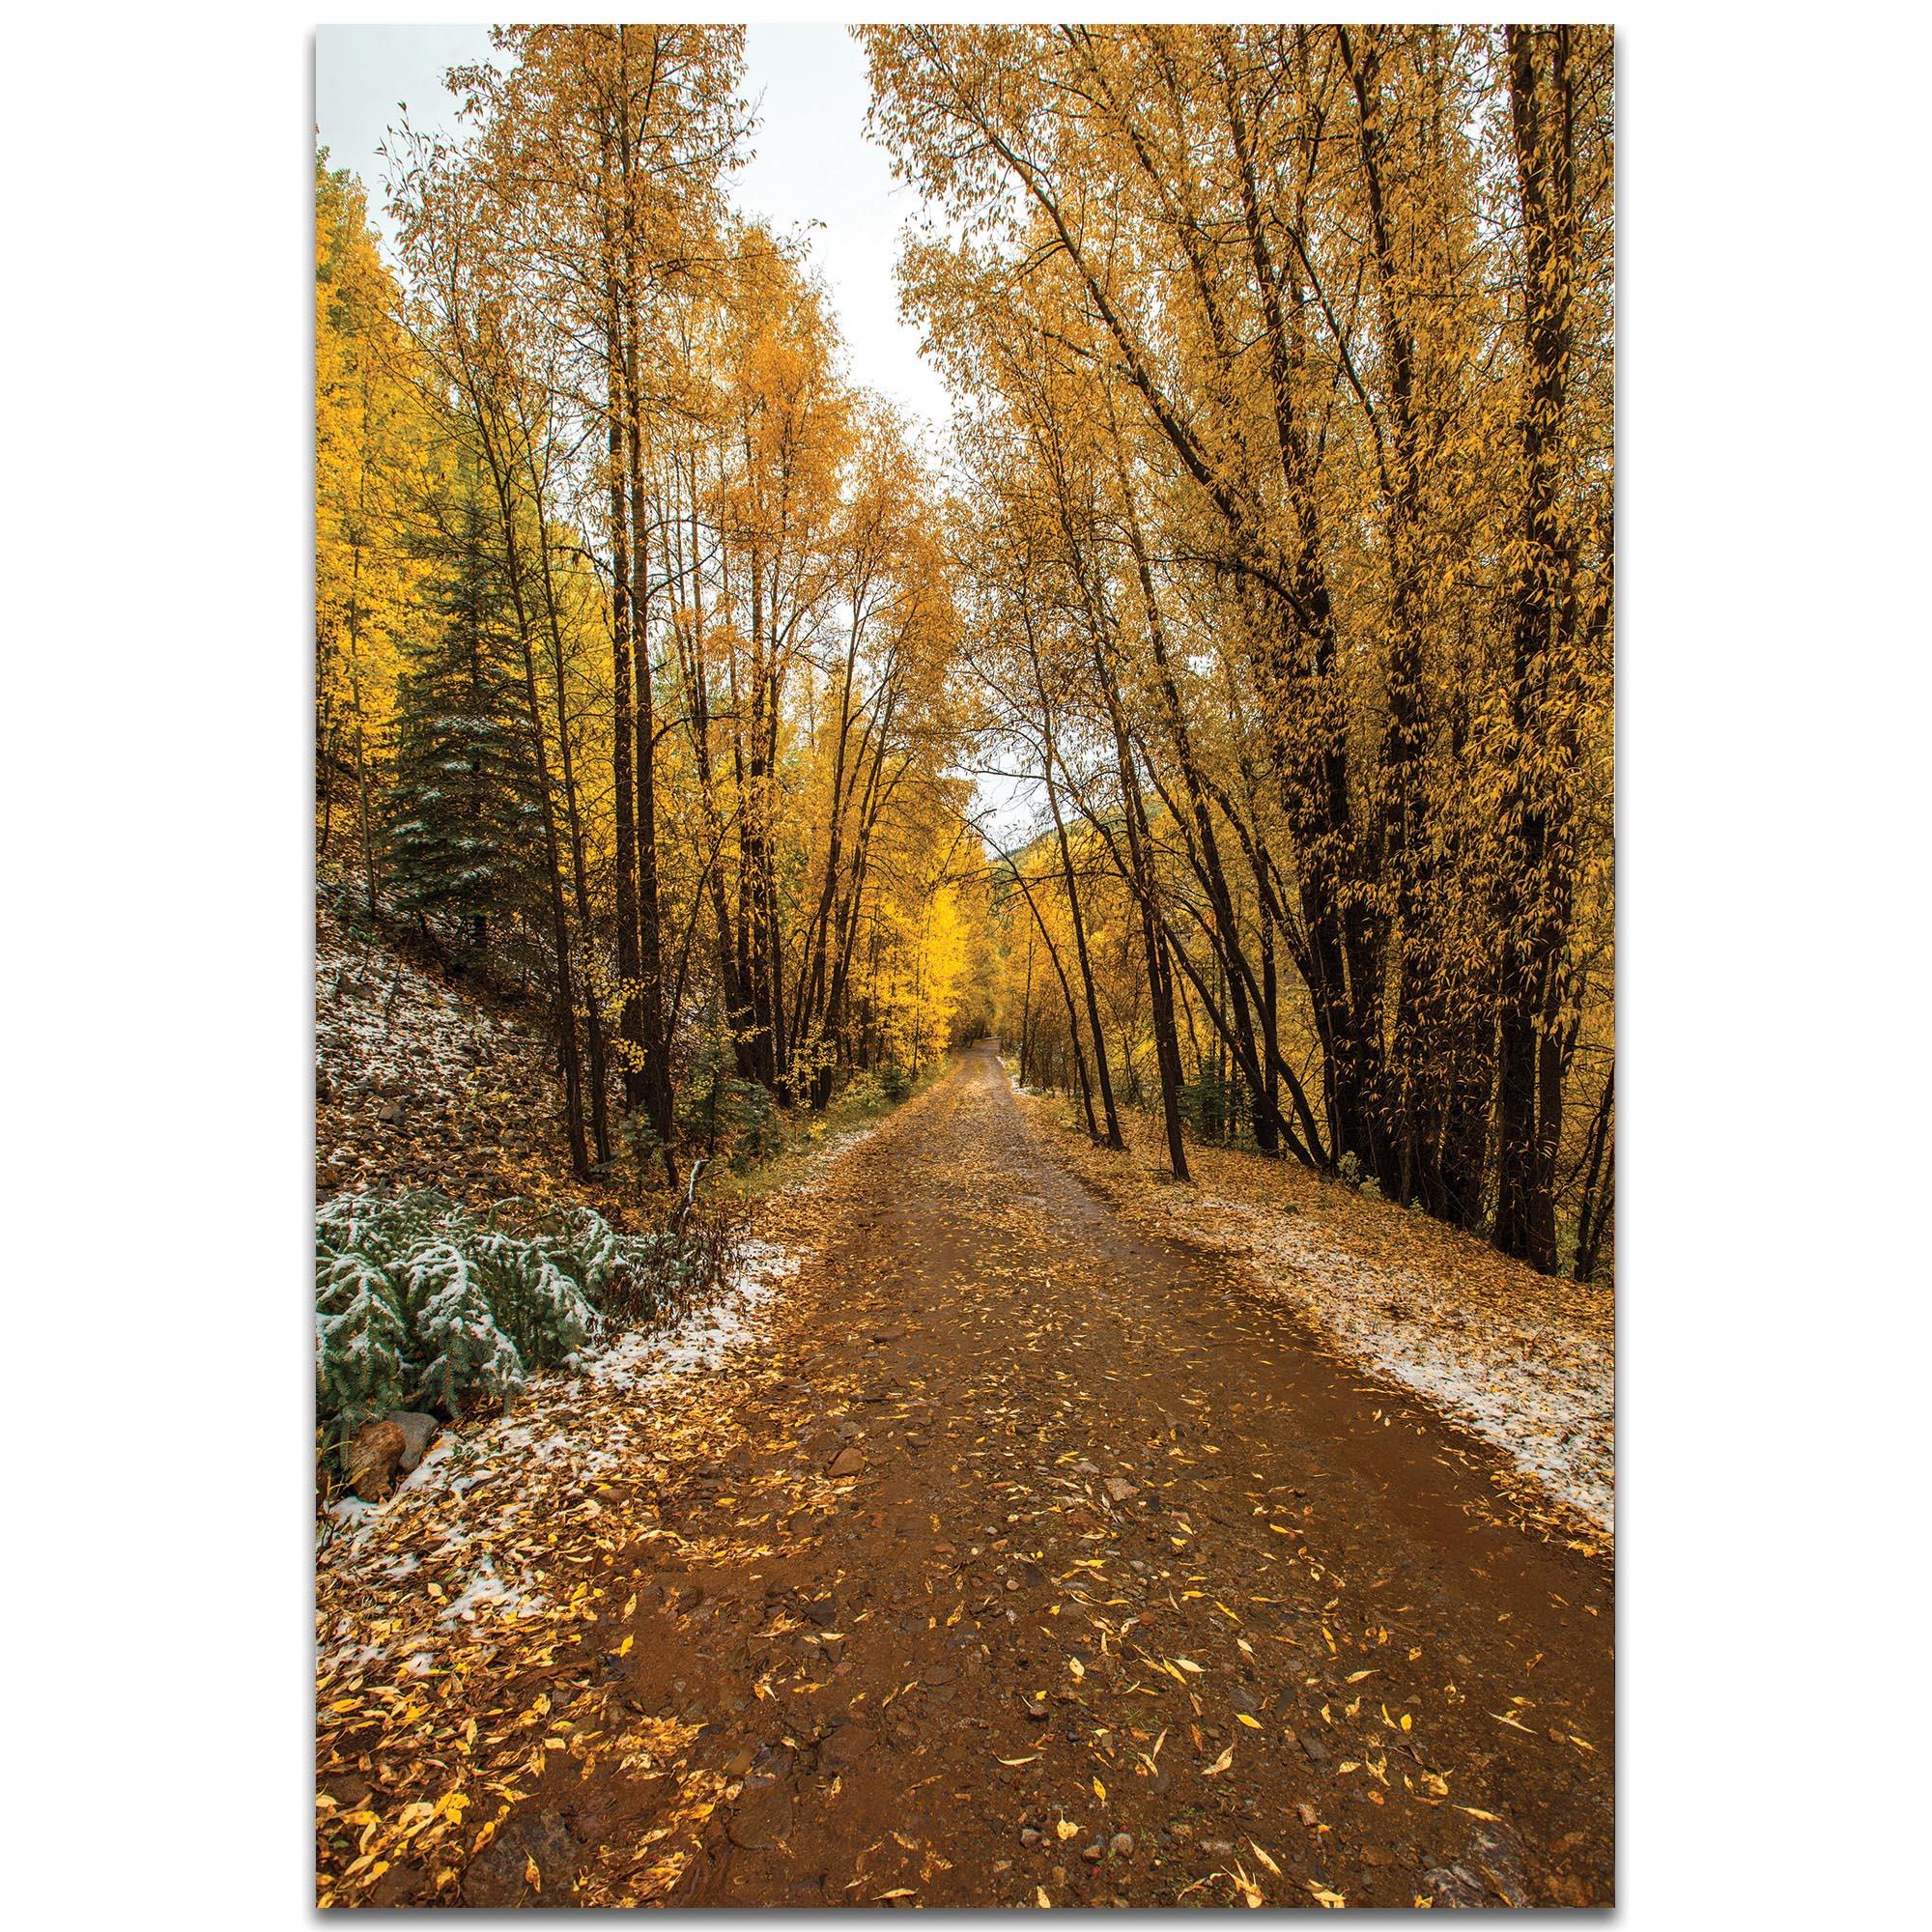 Landscape Photography 'Mountain Pass' - Autumn Trees Art on Metal or Plexiglass